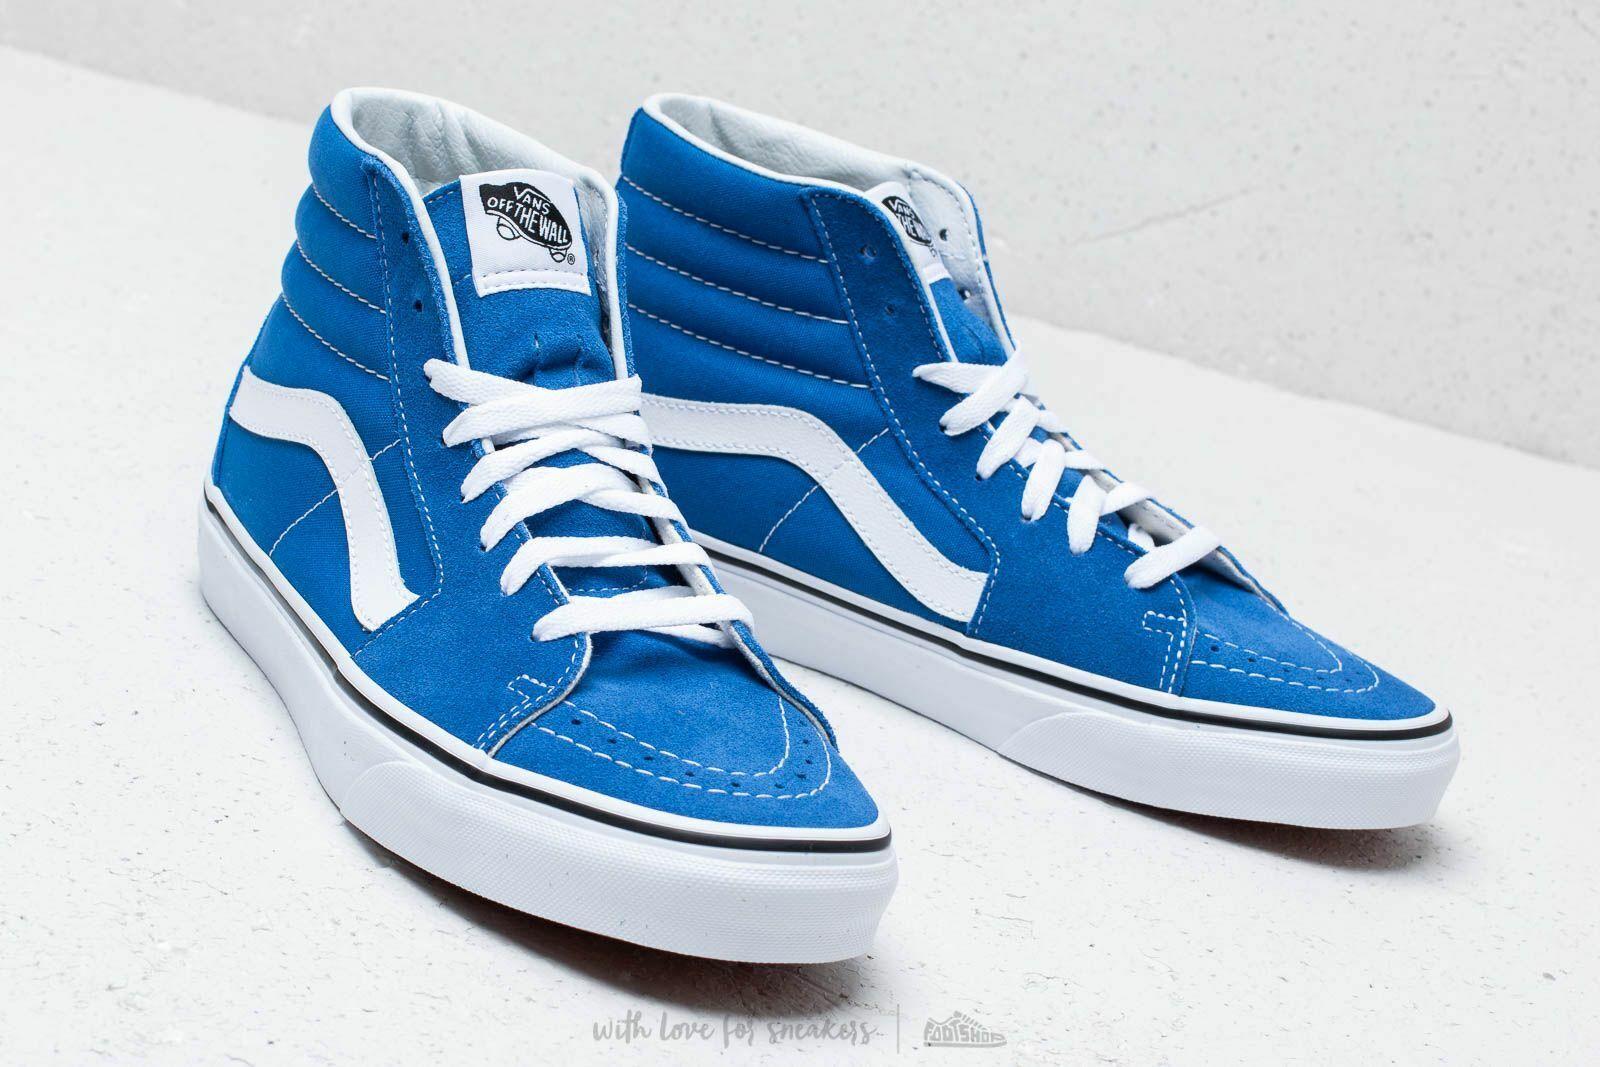 Vans SK8 Hi Lapis Blue/True White Men's Classic Skate Shoes